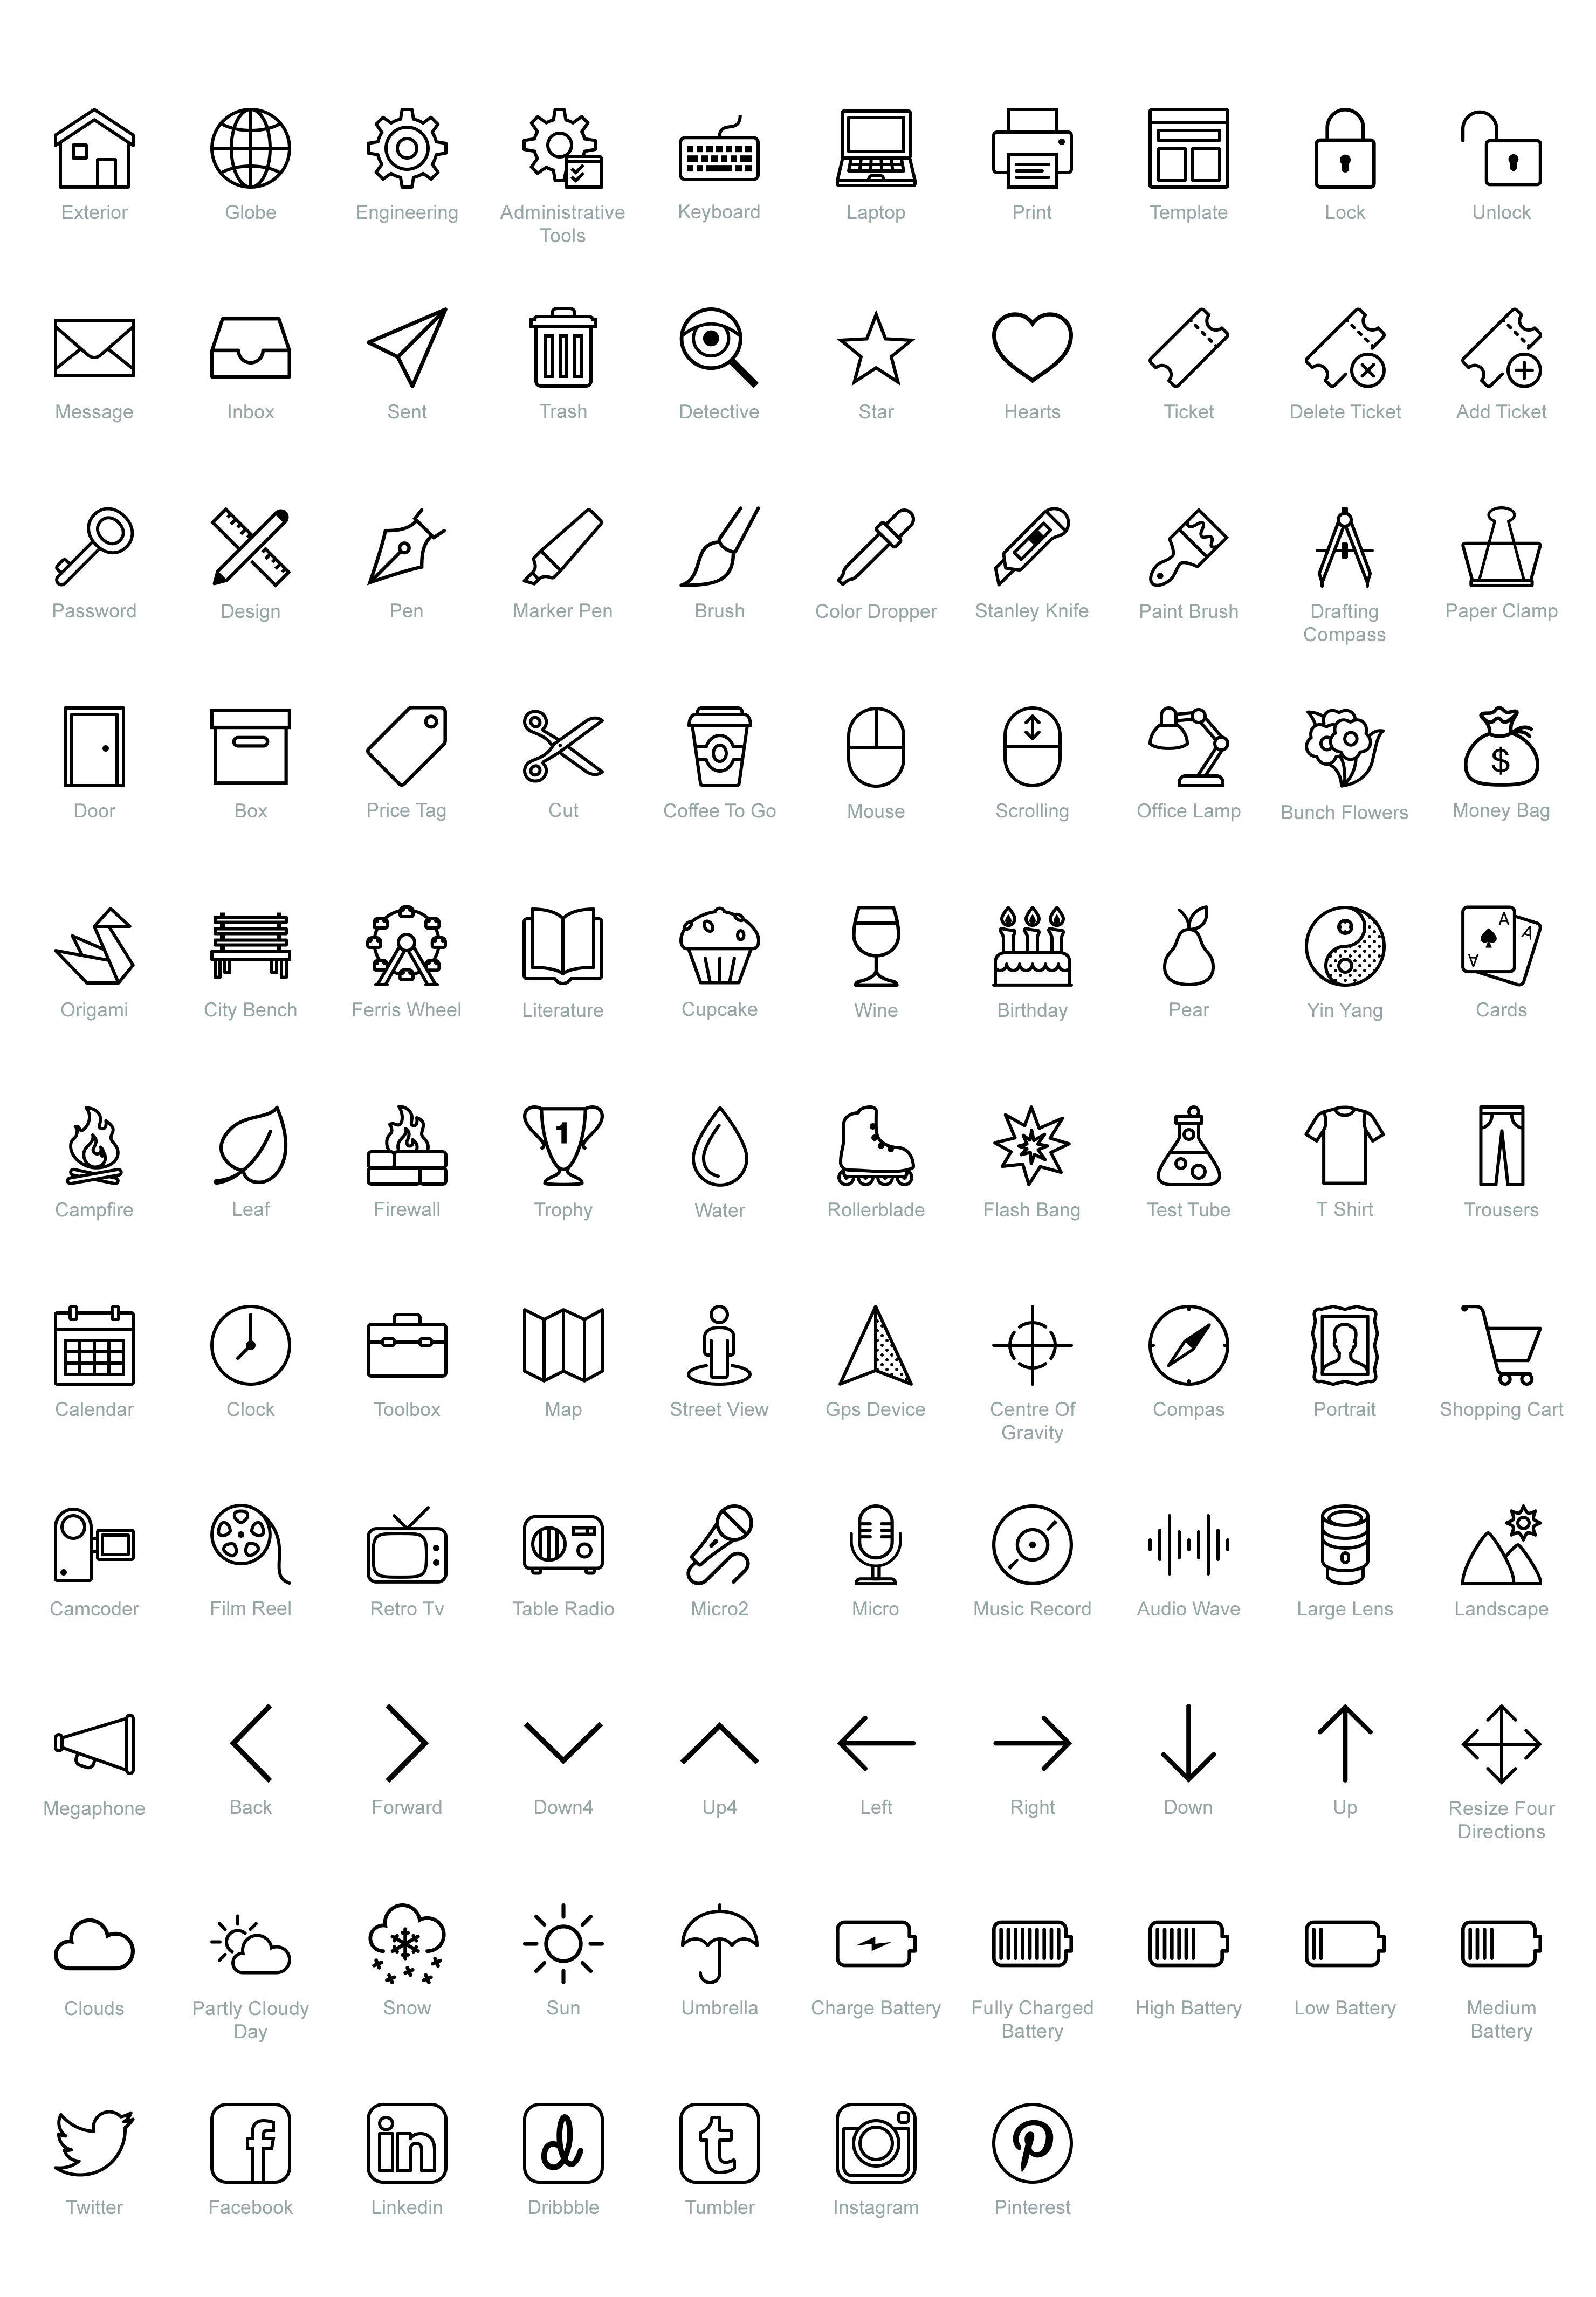 100+ free PSD icons for iOS [+ bonus] by Icons8 Resume